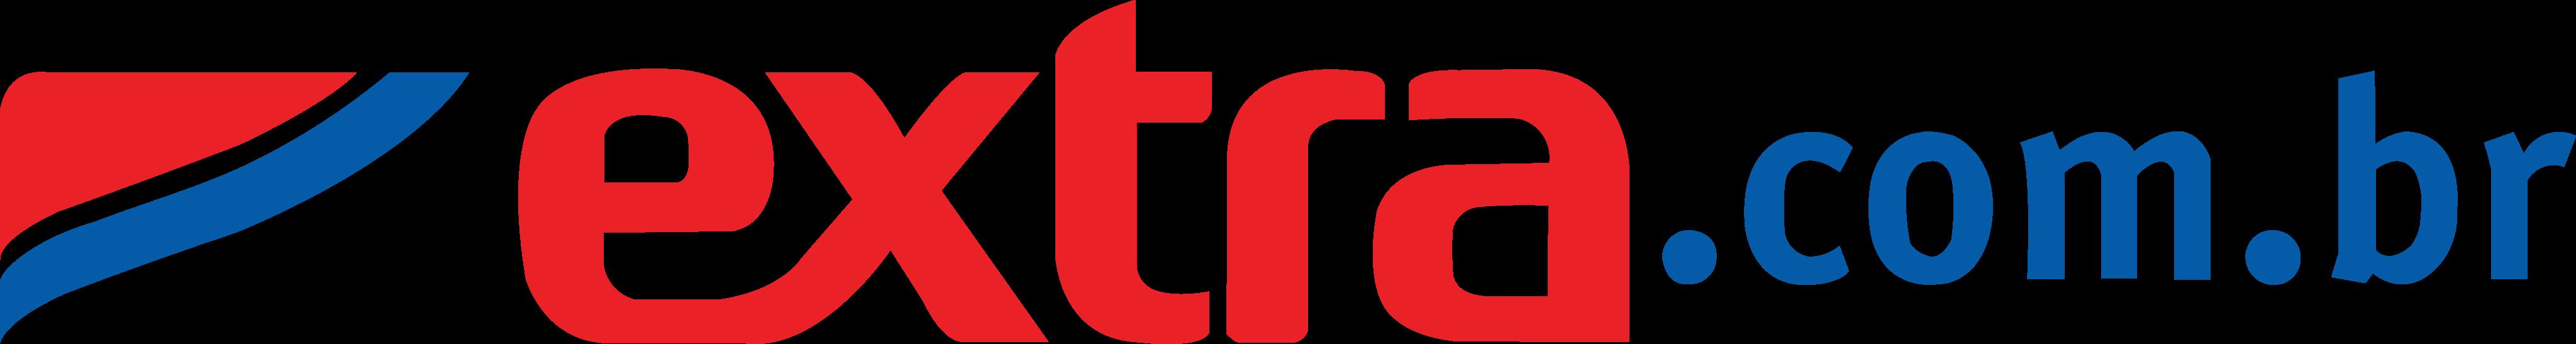 extra com br logo - Extra Logo - Extra.com.br Logo